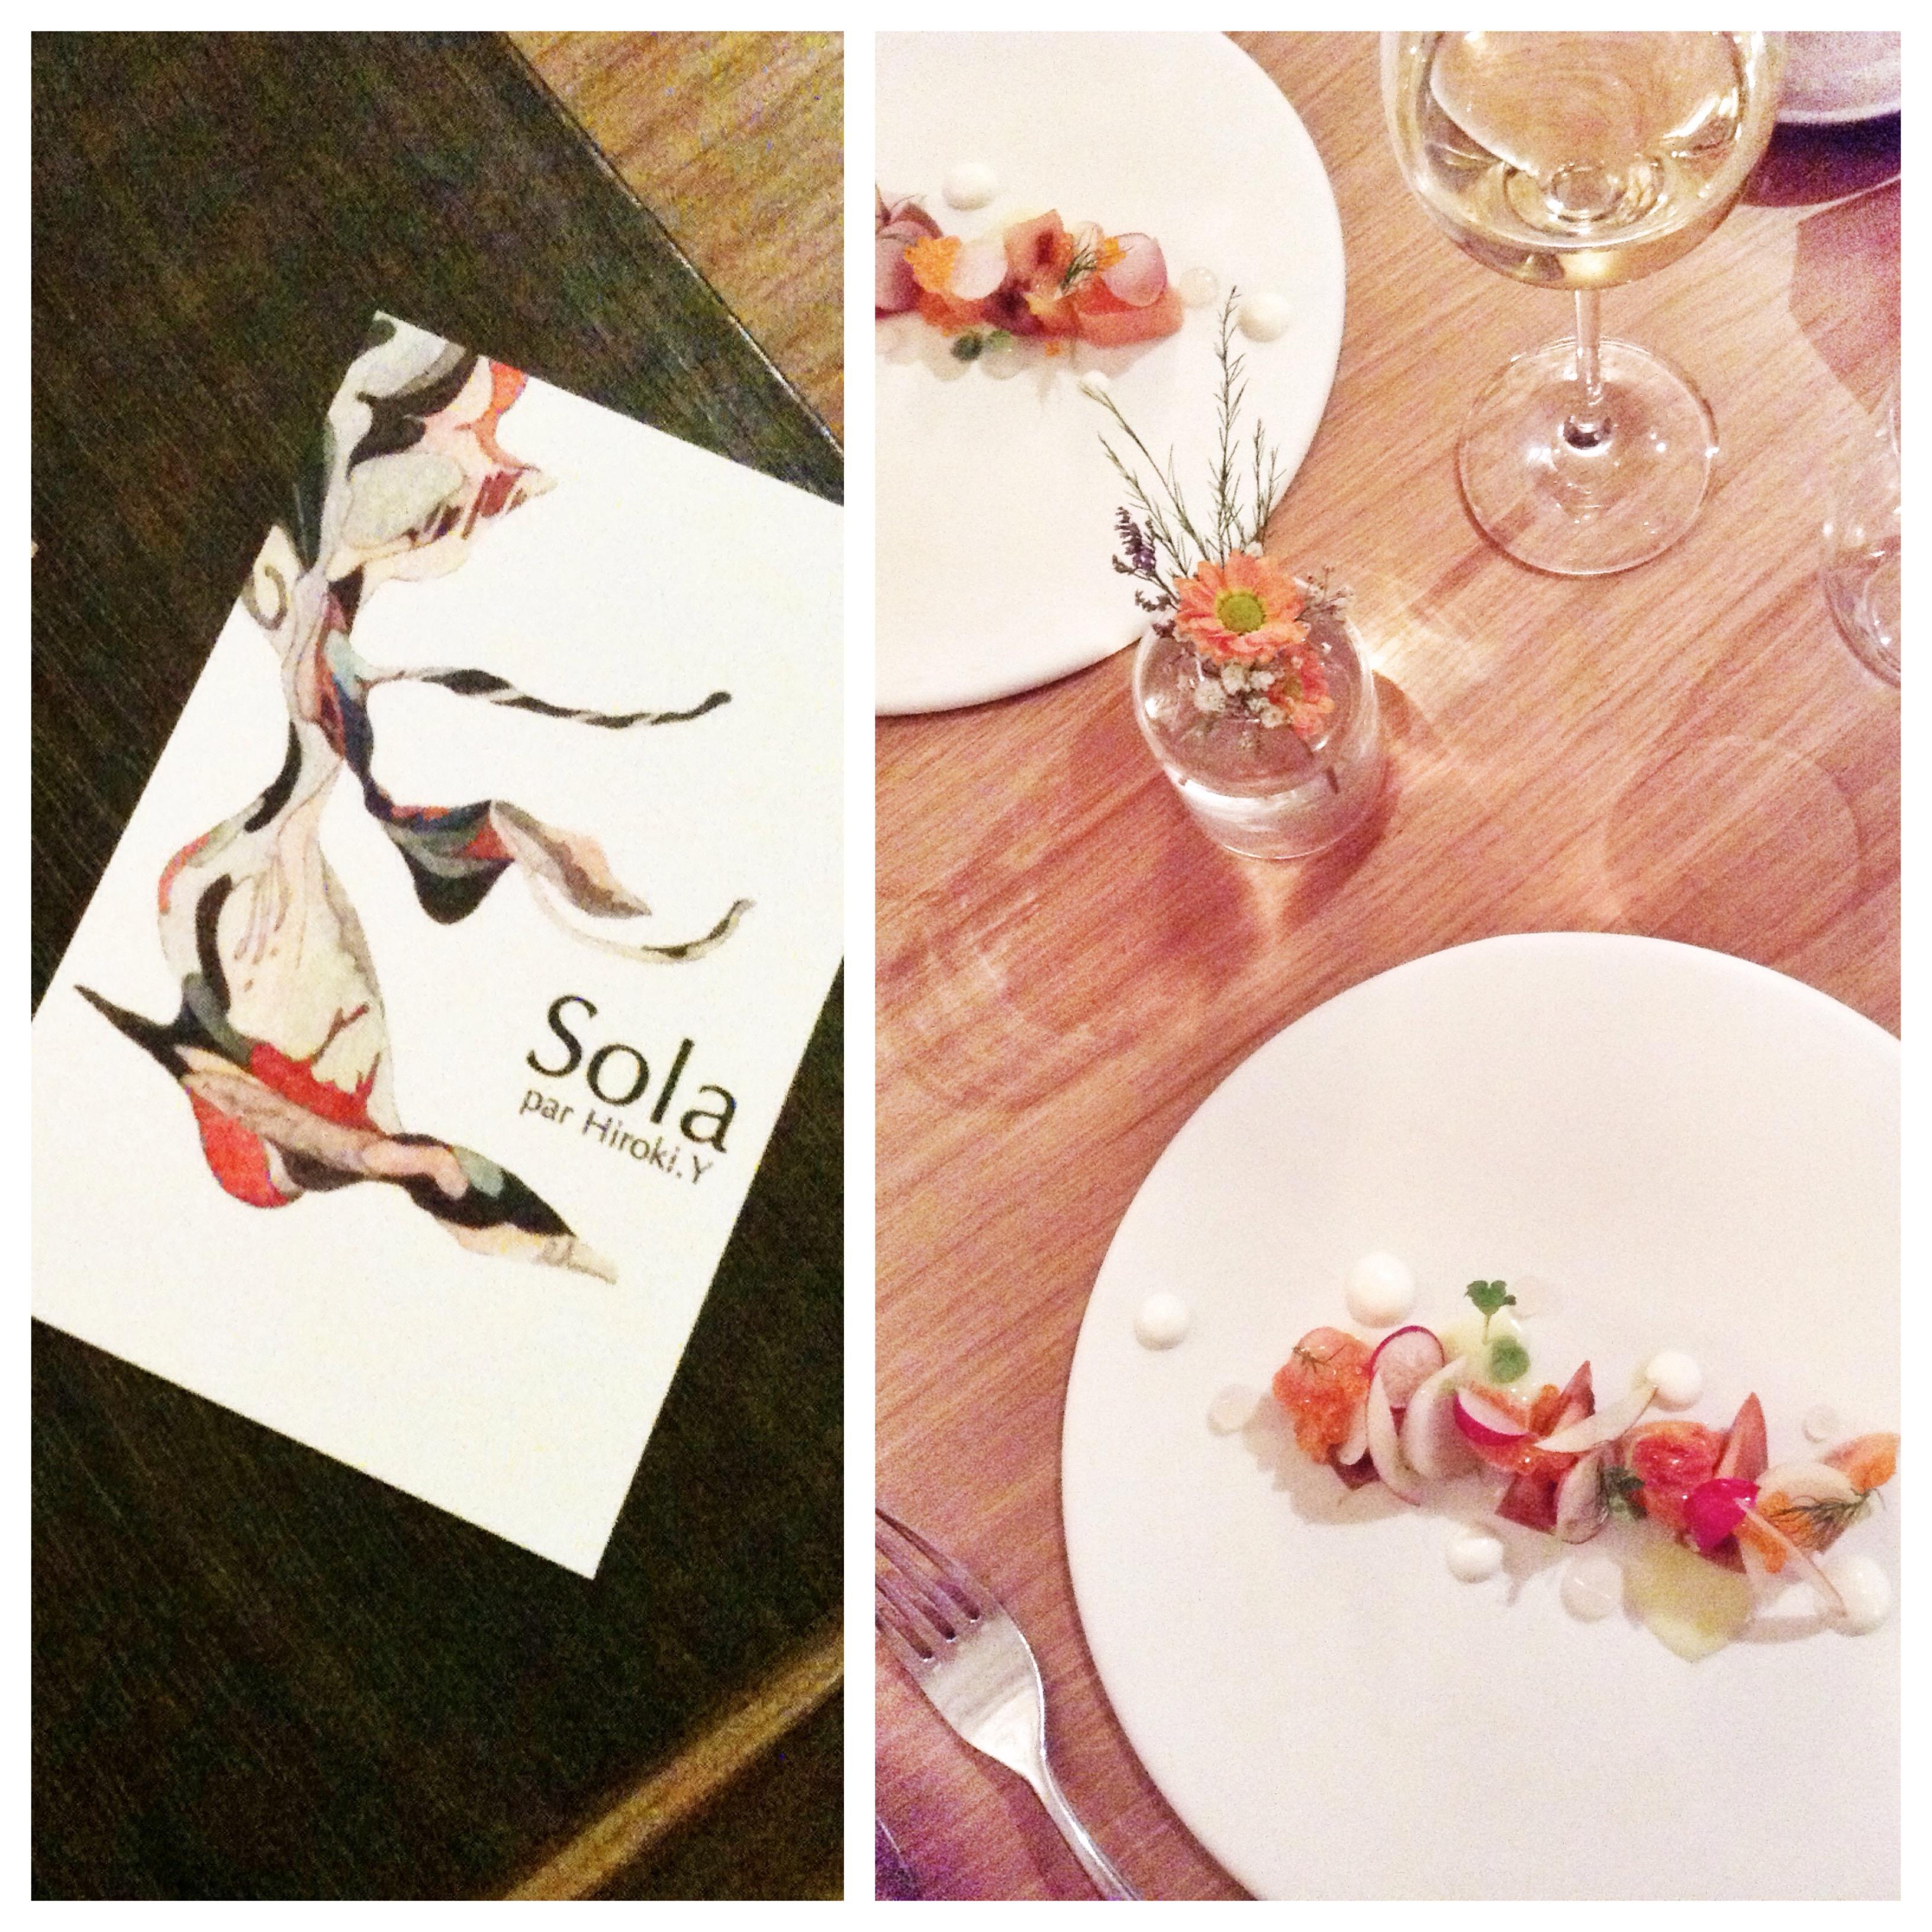 sola-restaurant-paris-etoile-awayoflooking_2226